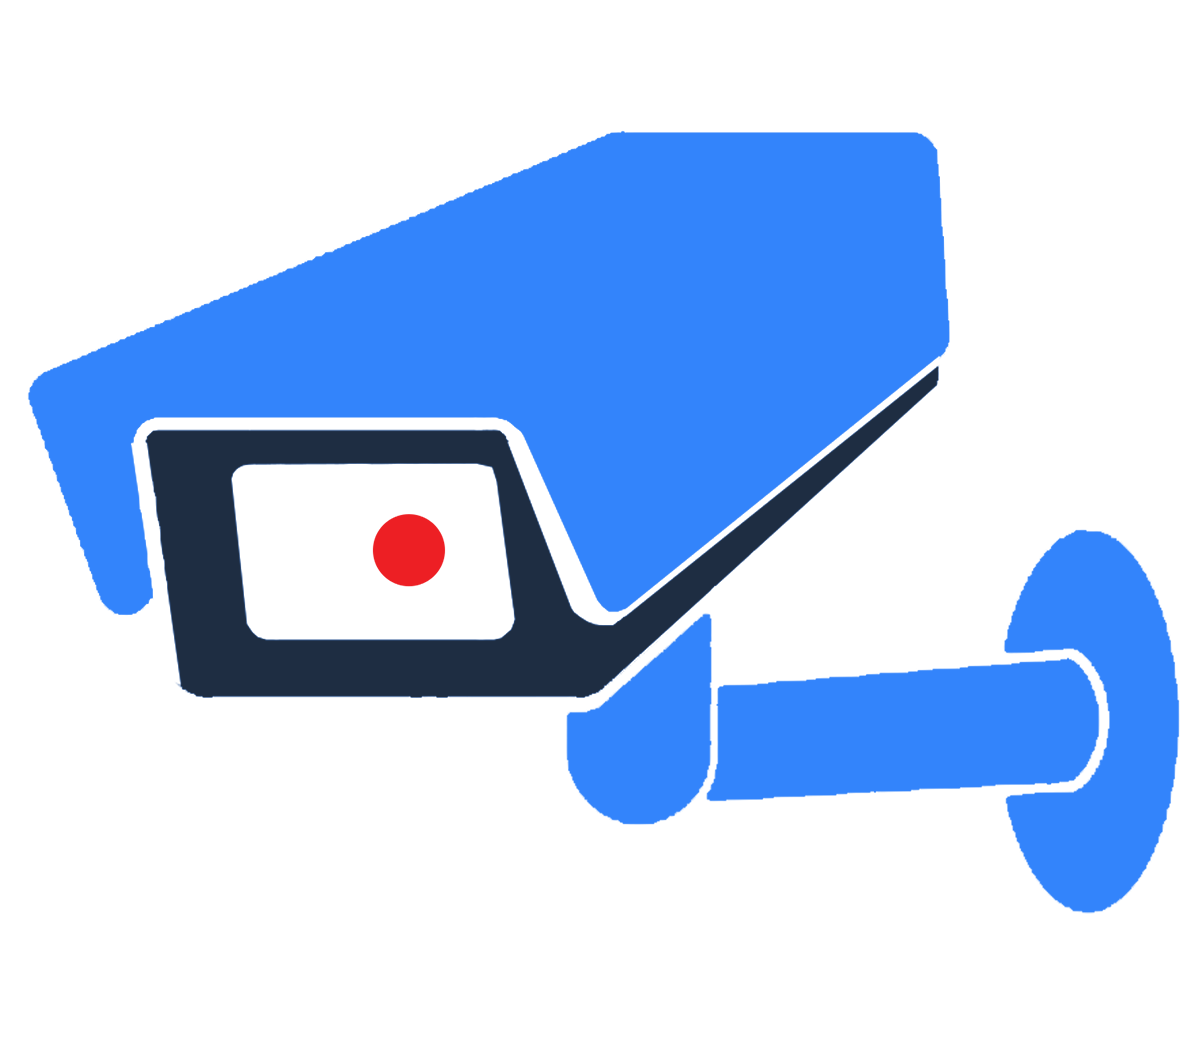 360-it-cctv-image